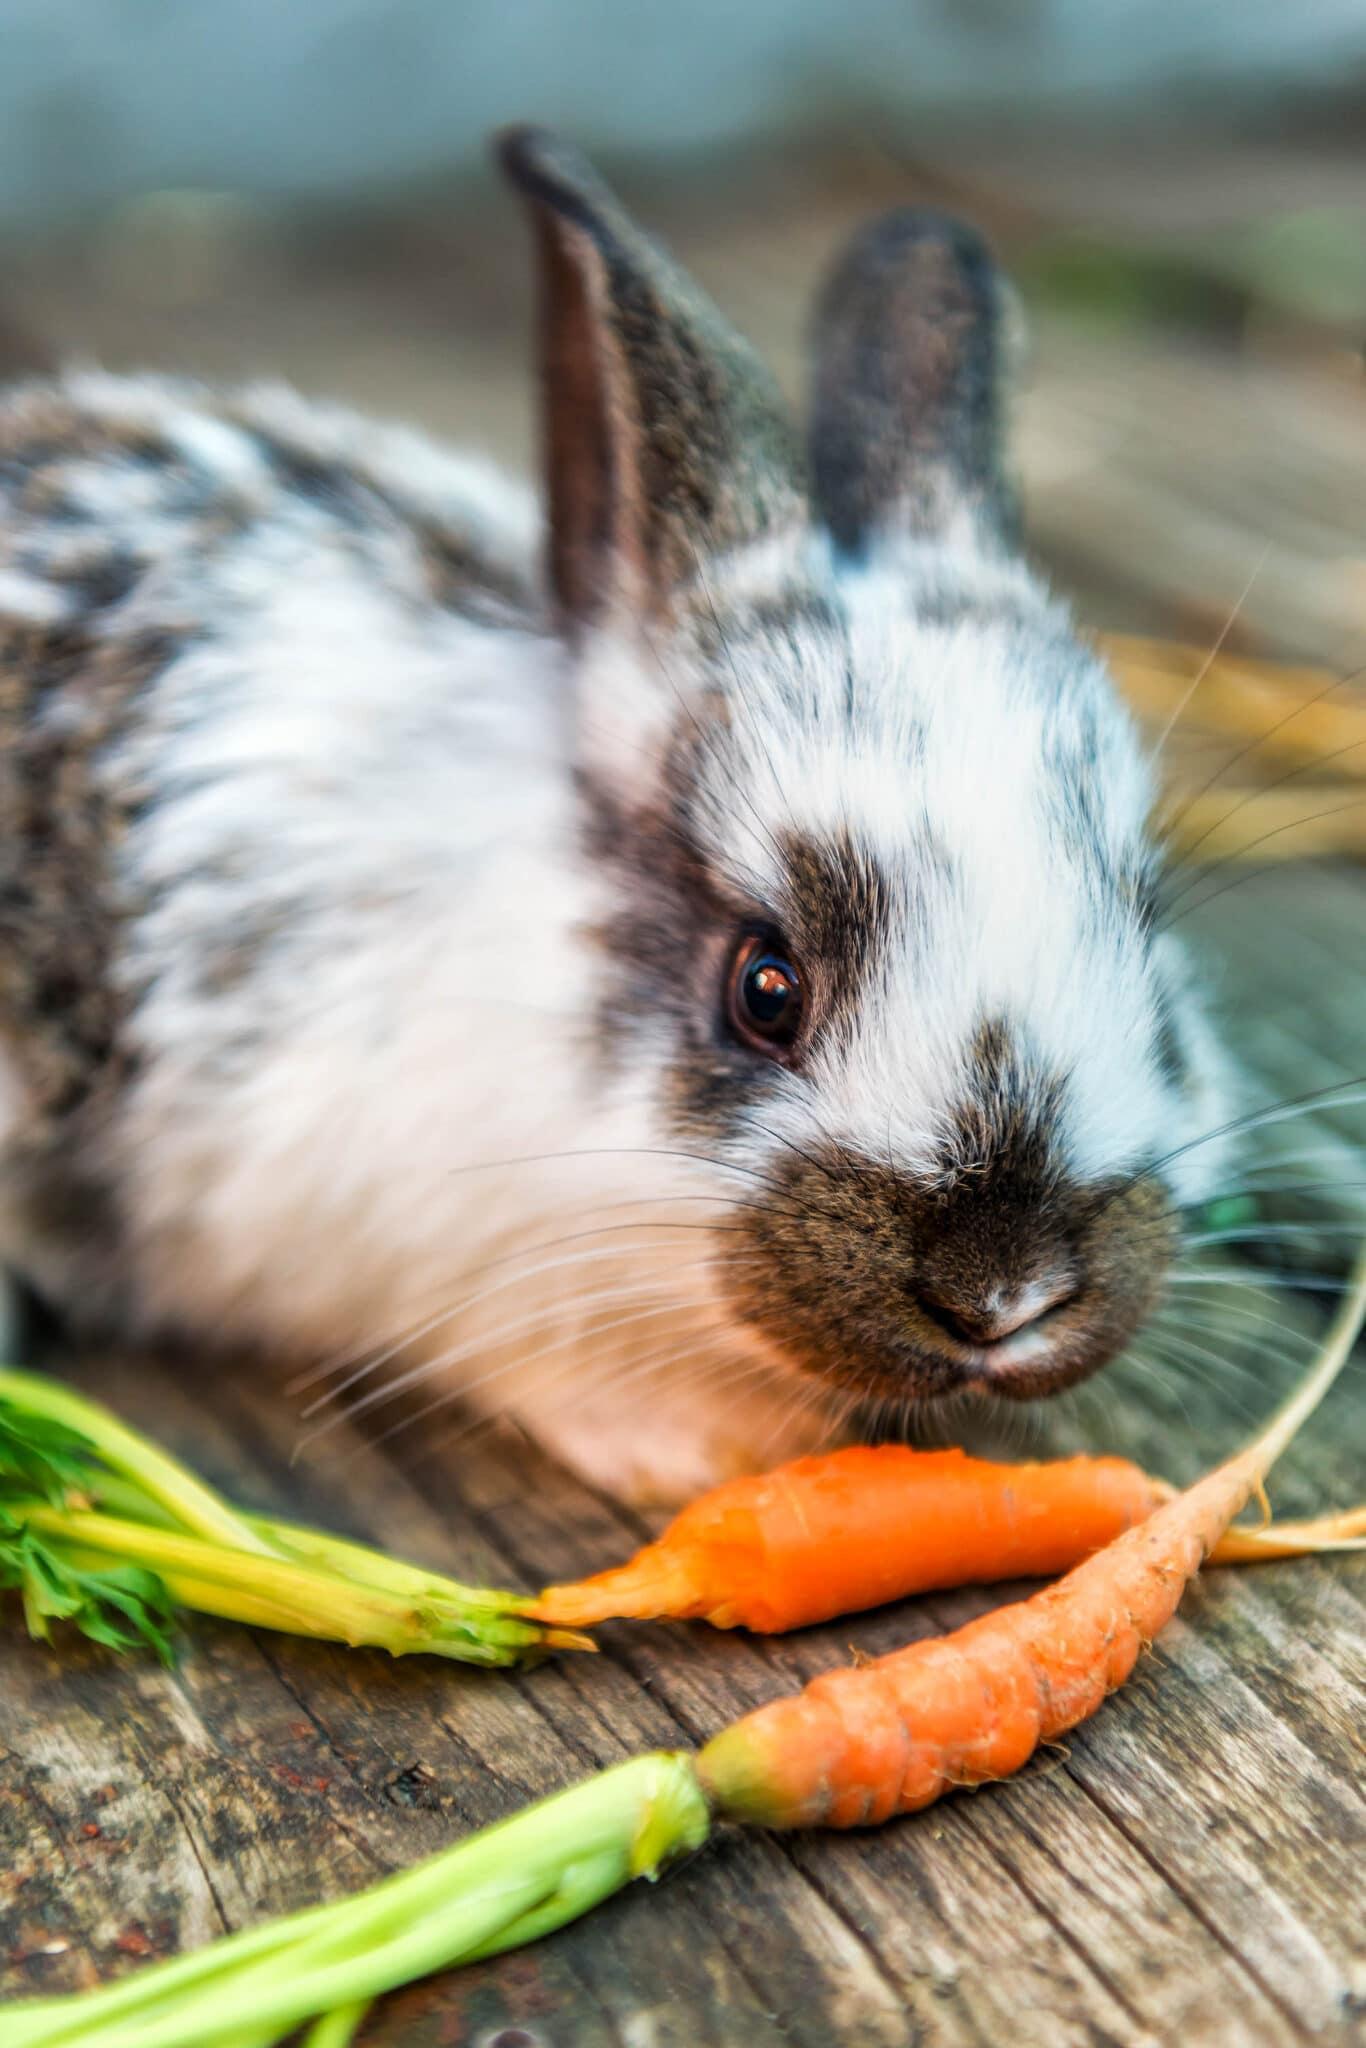 A closeup of a bunny eating a carrot.